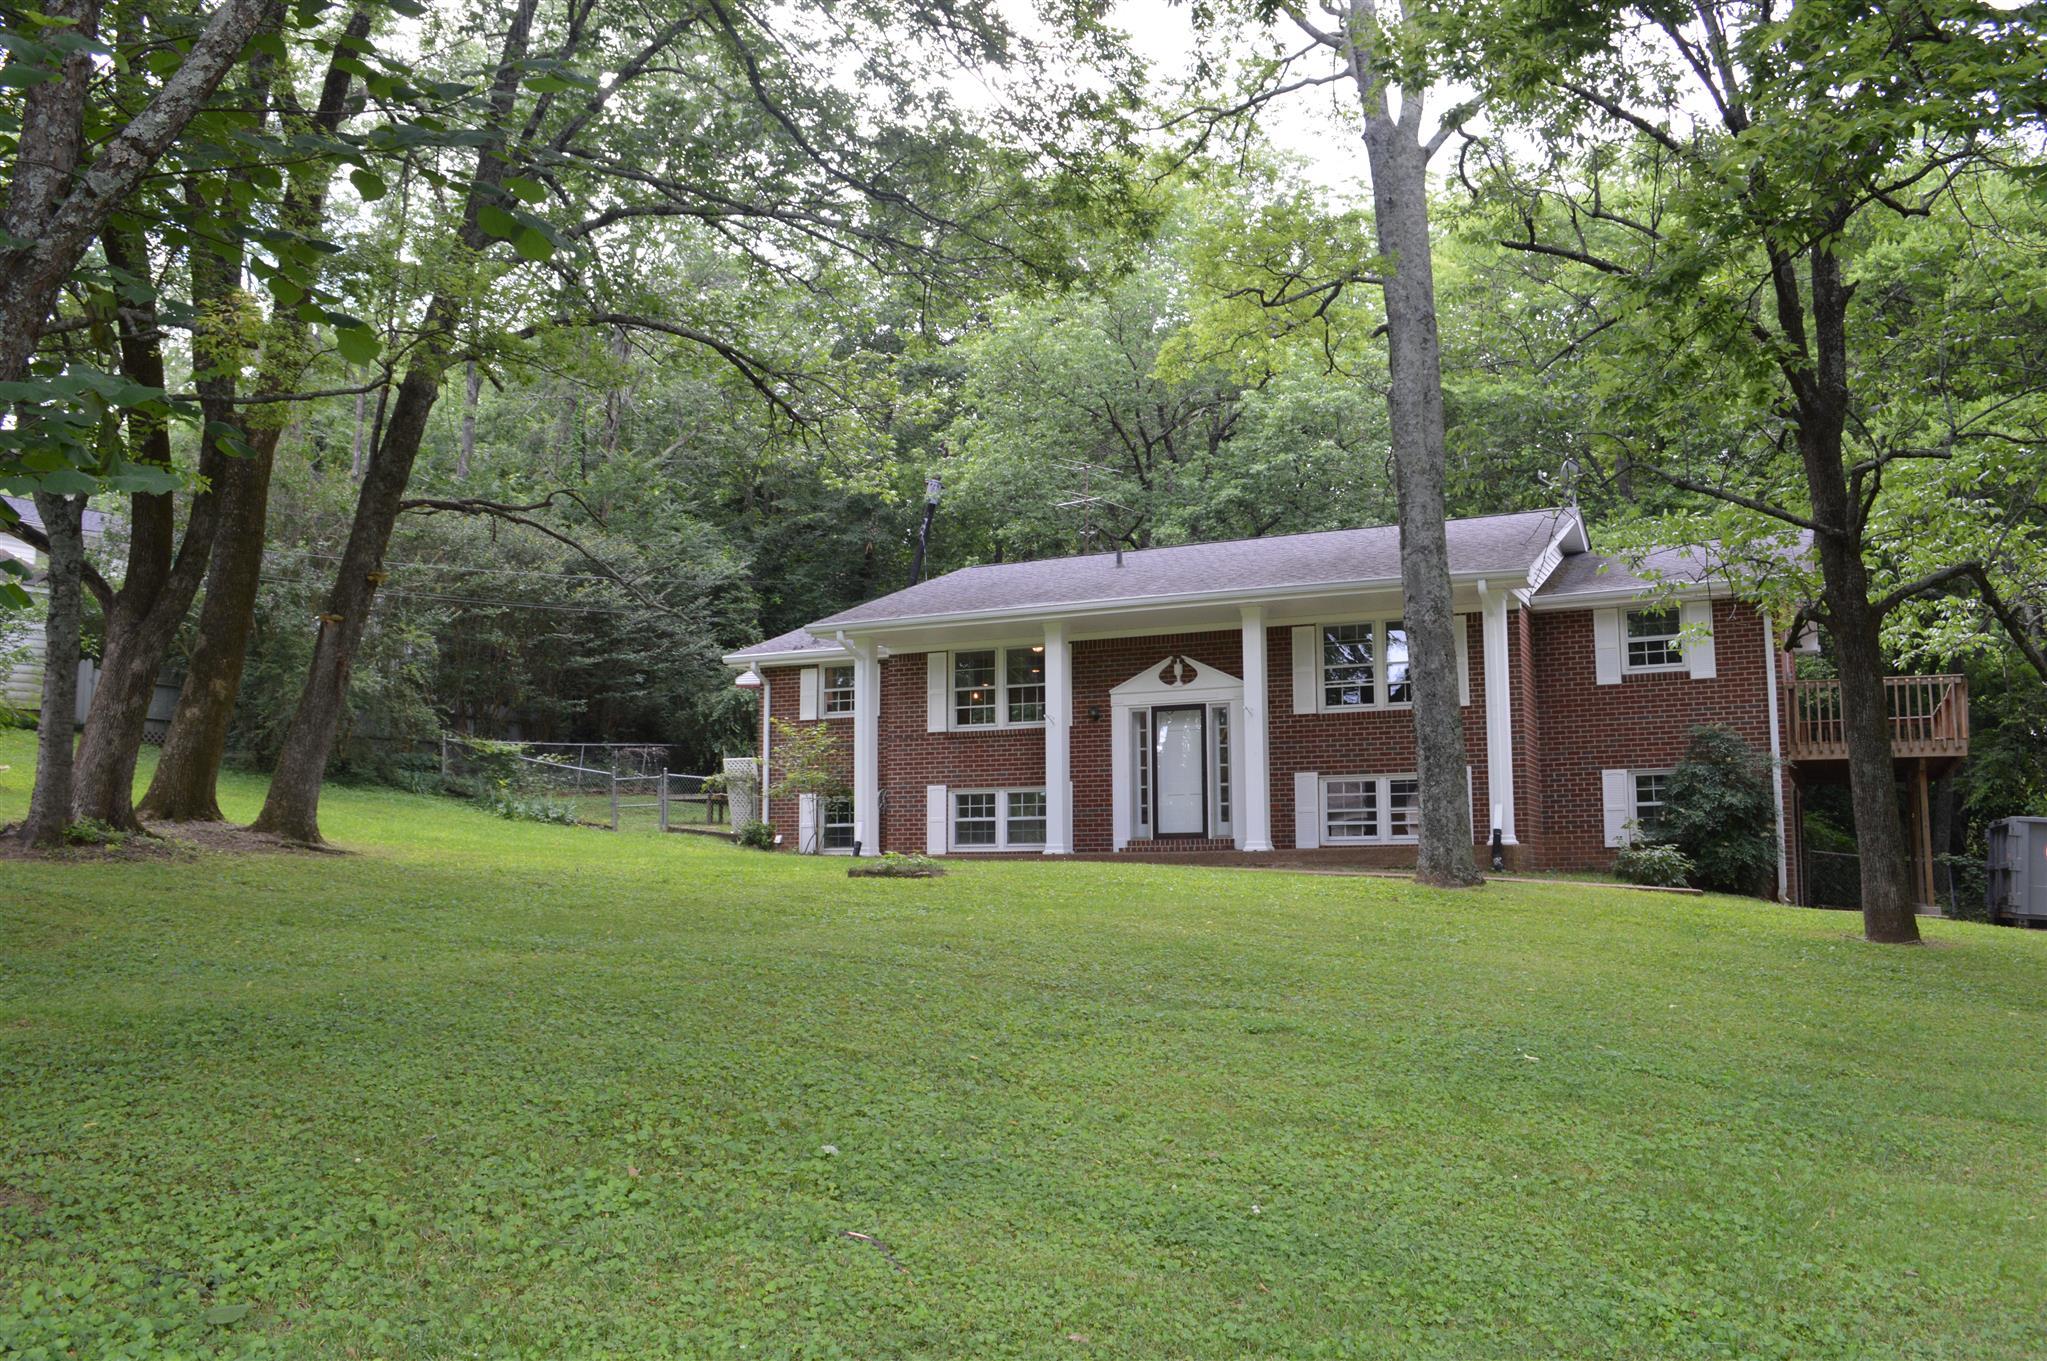 4303 Graycroft Ave, Nashville, TN 37216